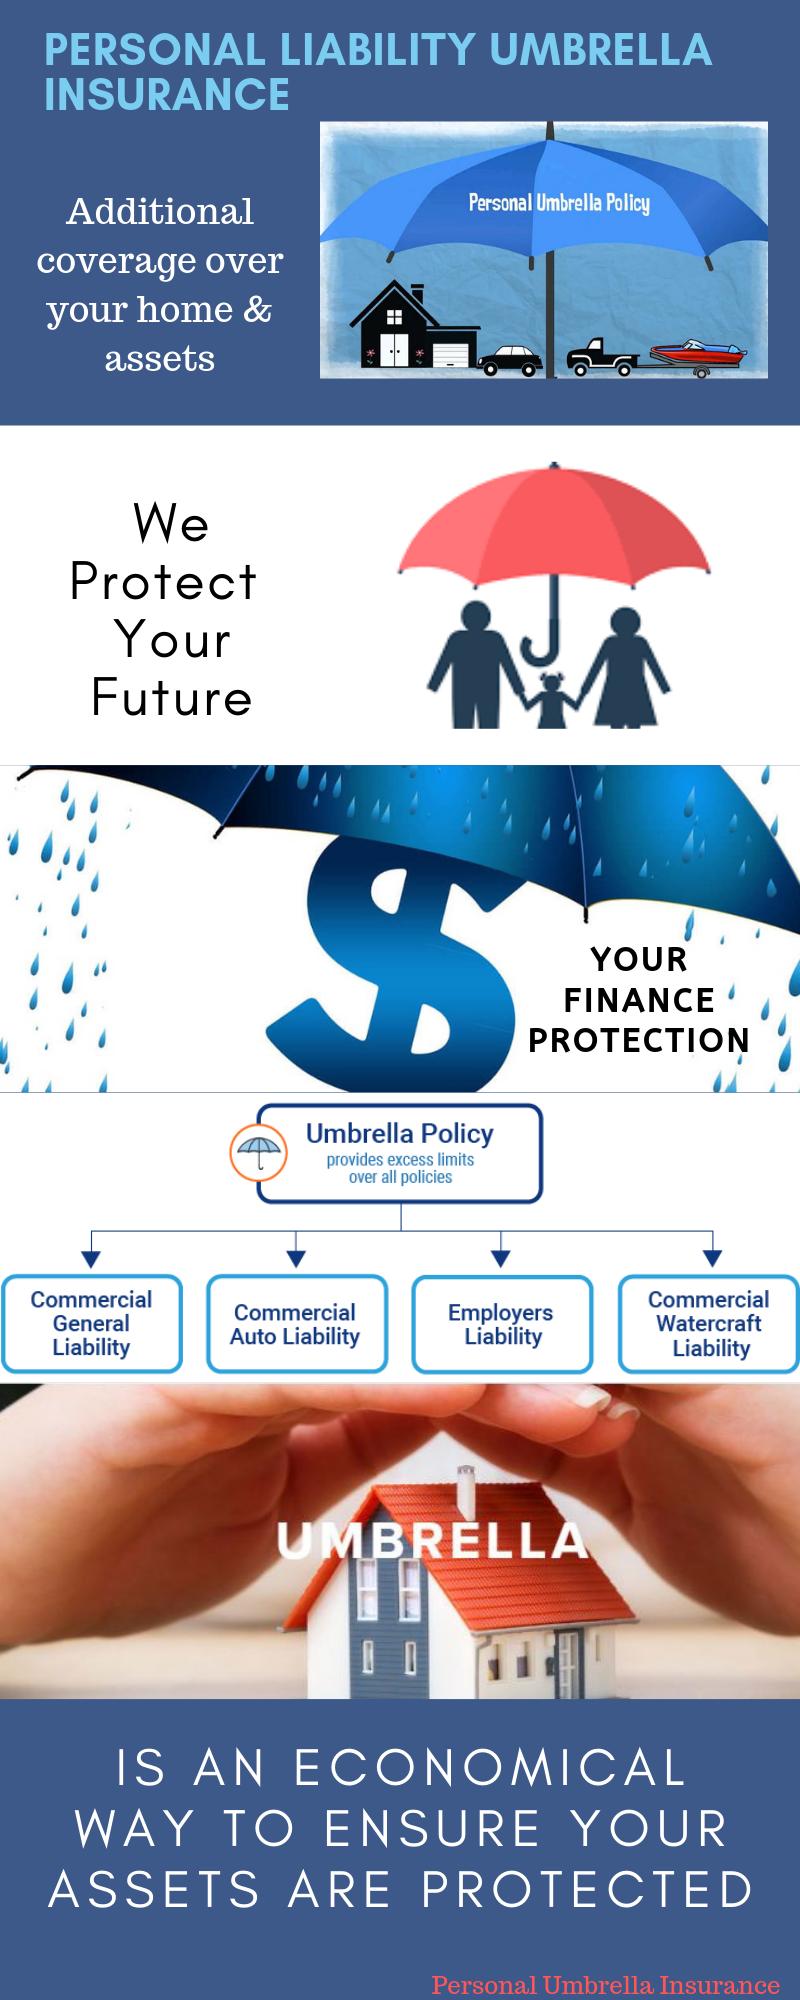 Personal Liability Umbrella Insurance Umbrella insurance